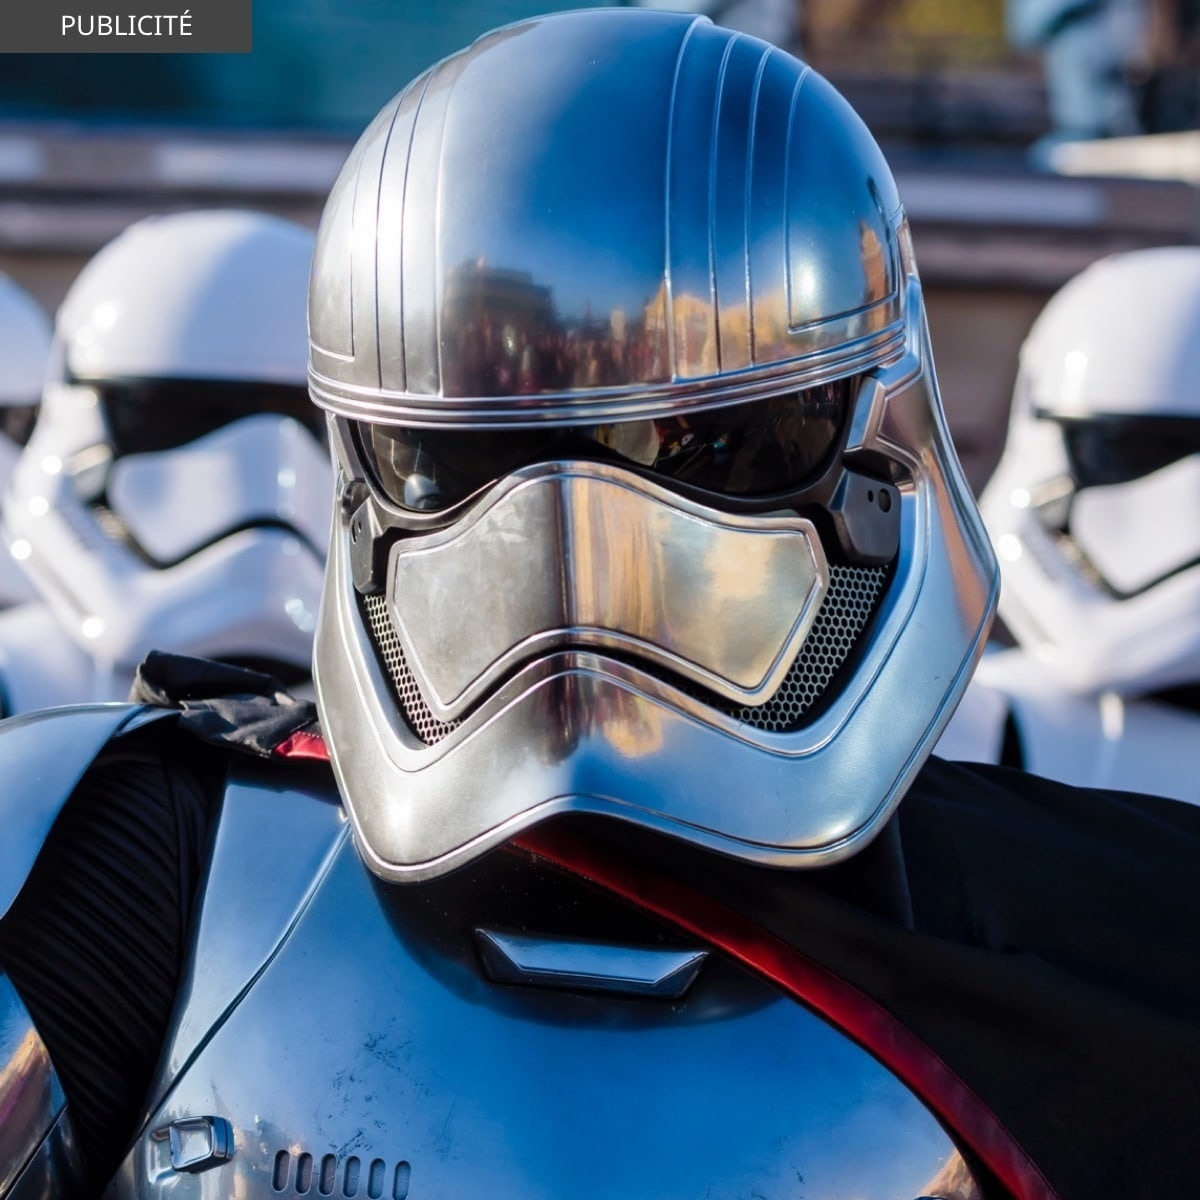 BE-FR - Star Wars The Last Jedi - Onward Journey - DLP Season of the Force - Flex Grid Object - Square